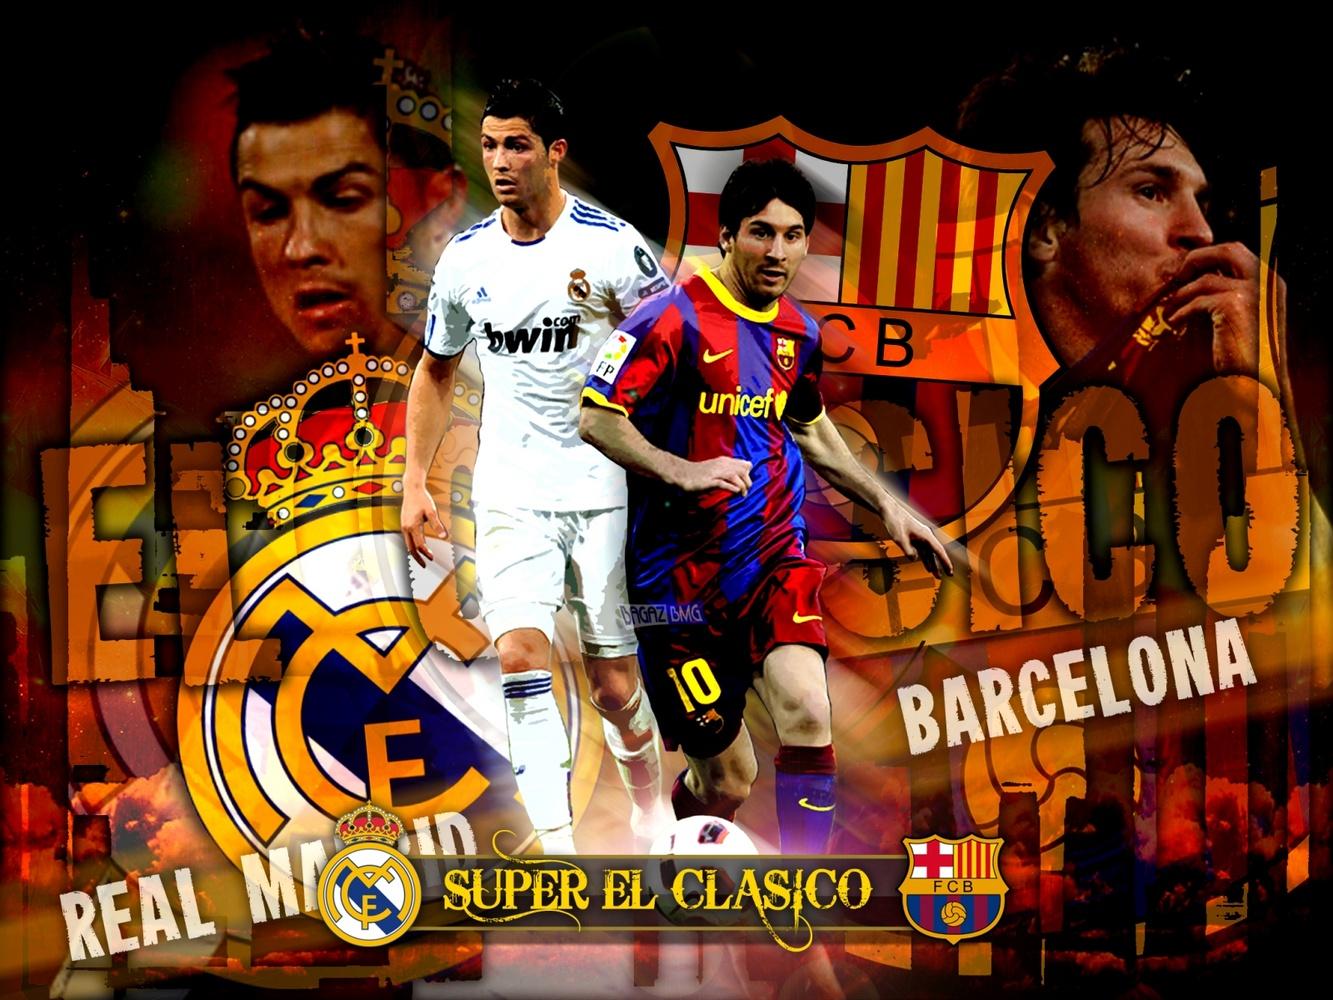 http://1.bp.blogspot.com/-vBZ7_VsAQWw/TuqyZ3EpSsI/AAAAAAAAAAw/Rdpouhg6UnY/s1600/Lionel+Messi+%2526+Cristiano+Ronaldo+Wallpaper.jpeg